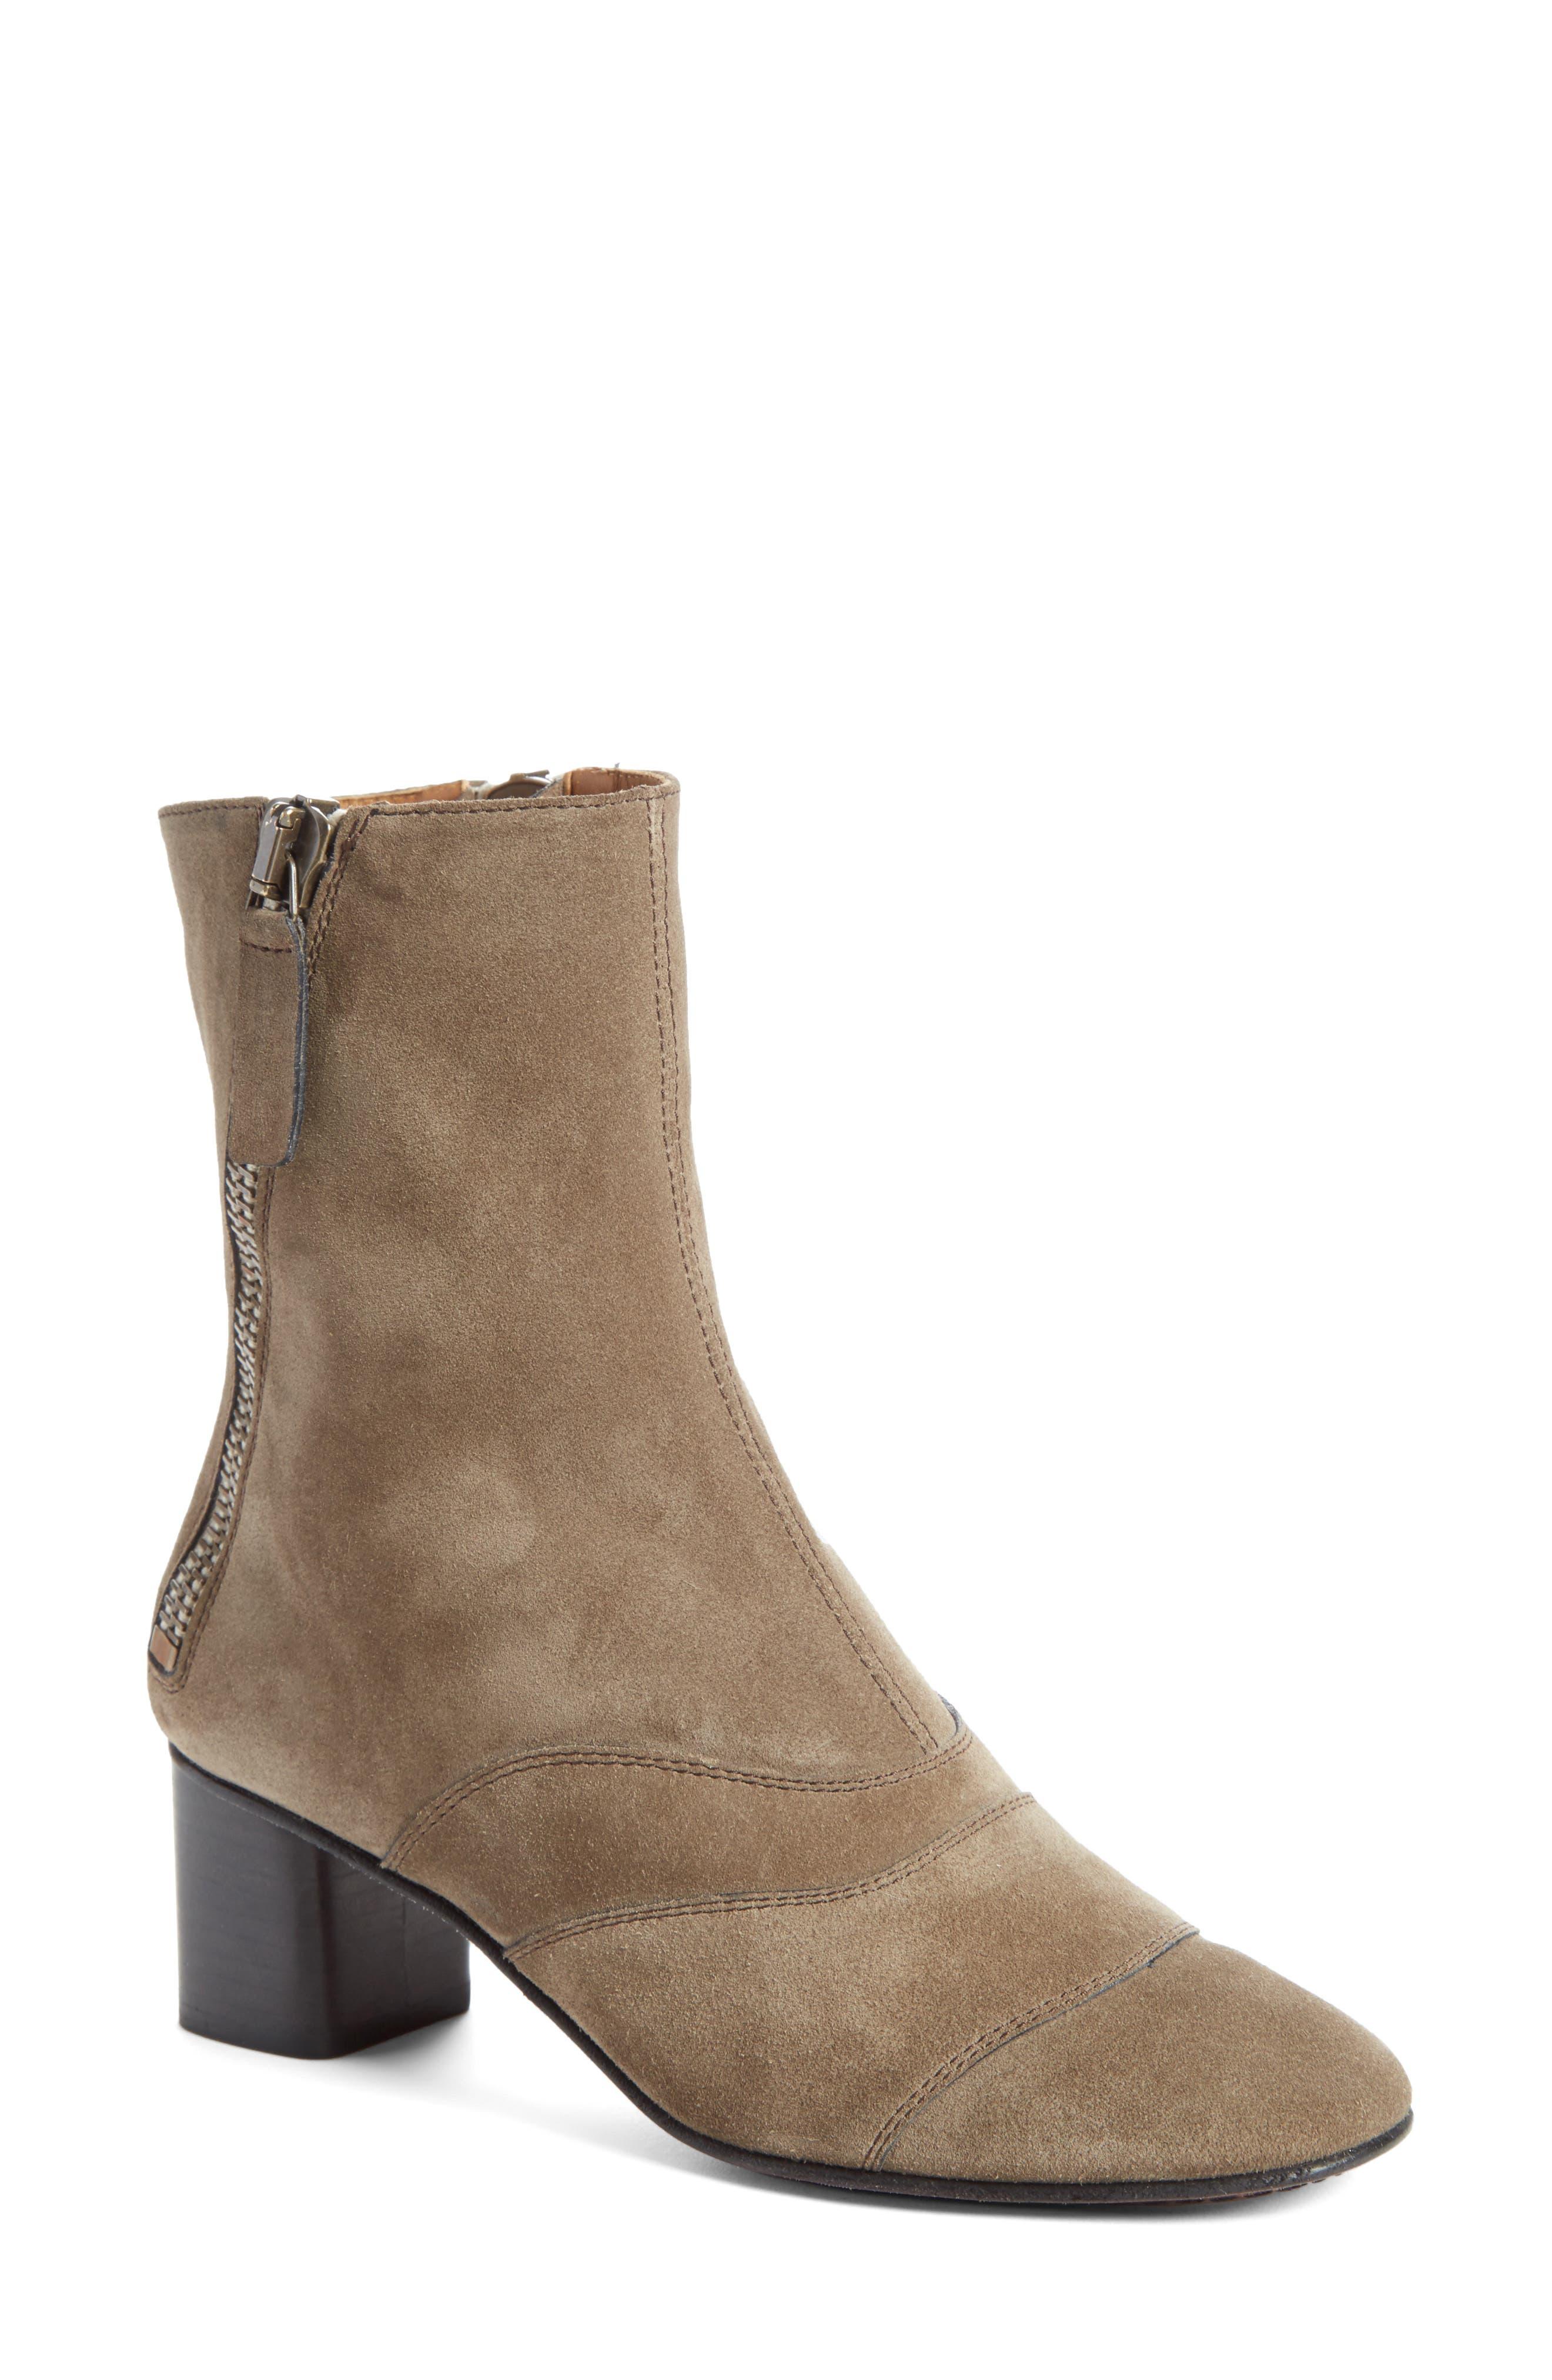 Main Image - Chloé Lexie Block Heel Boot (Women)